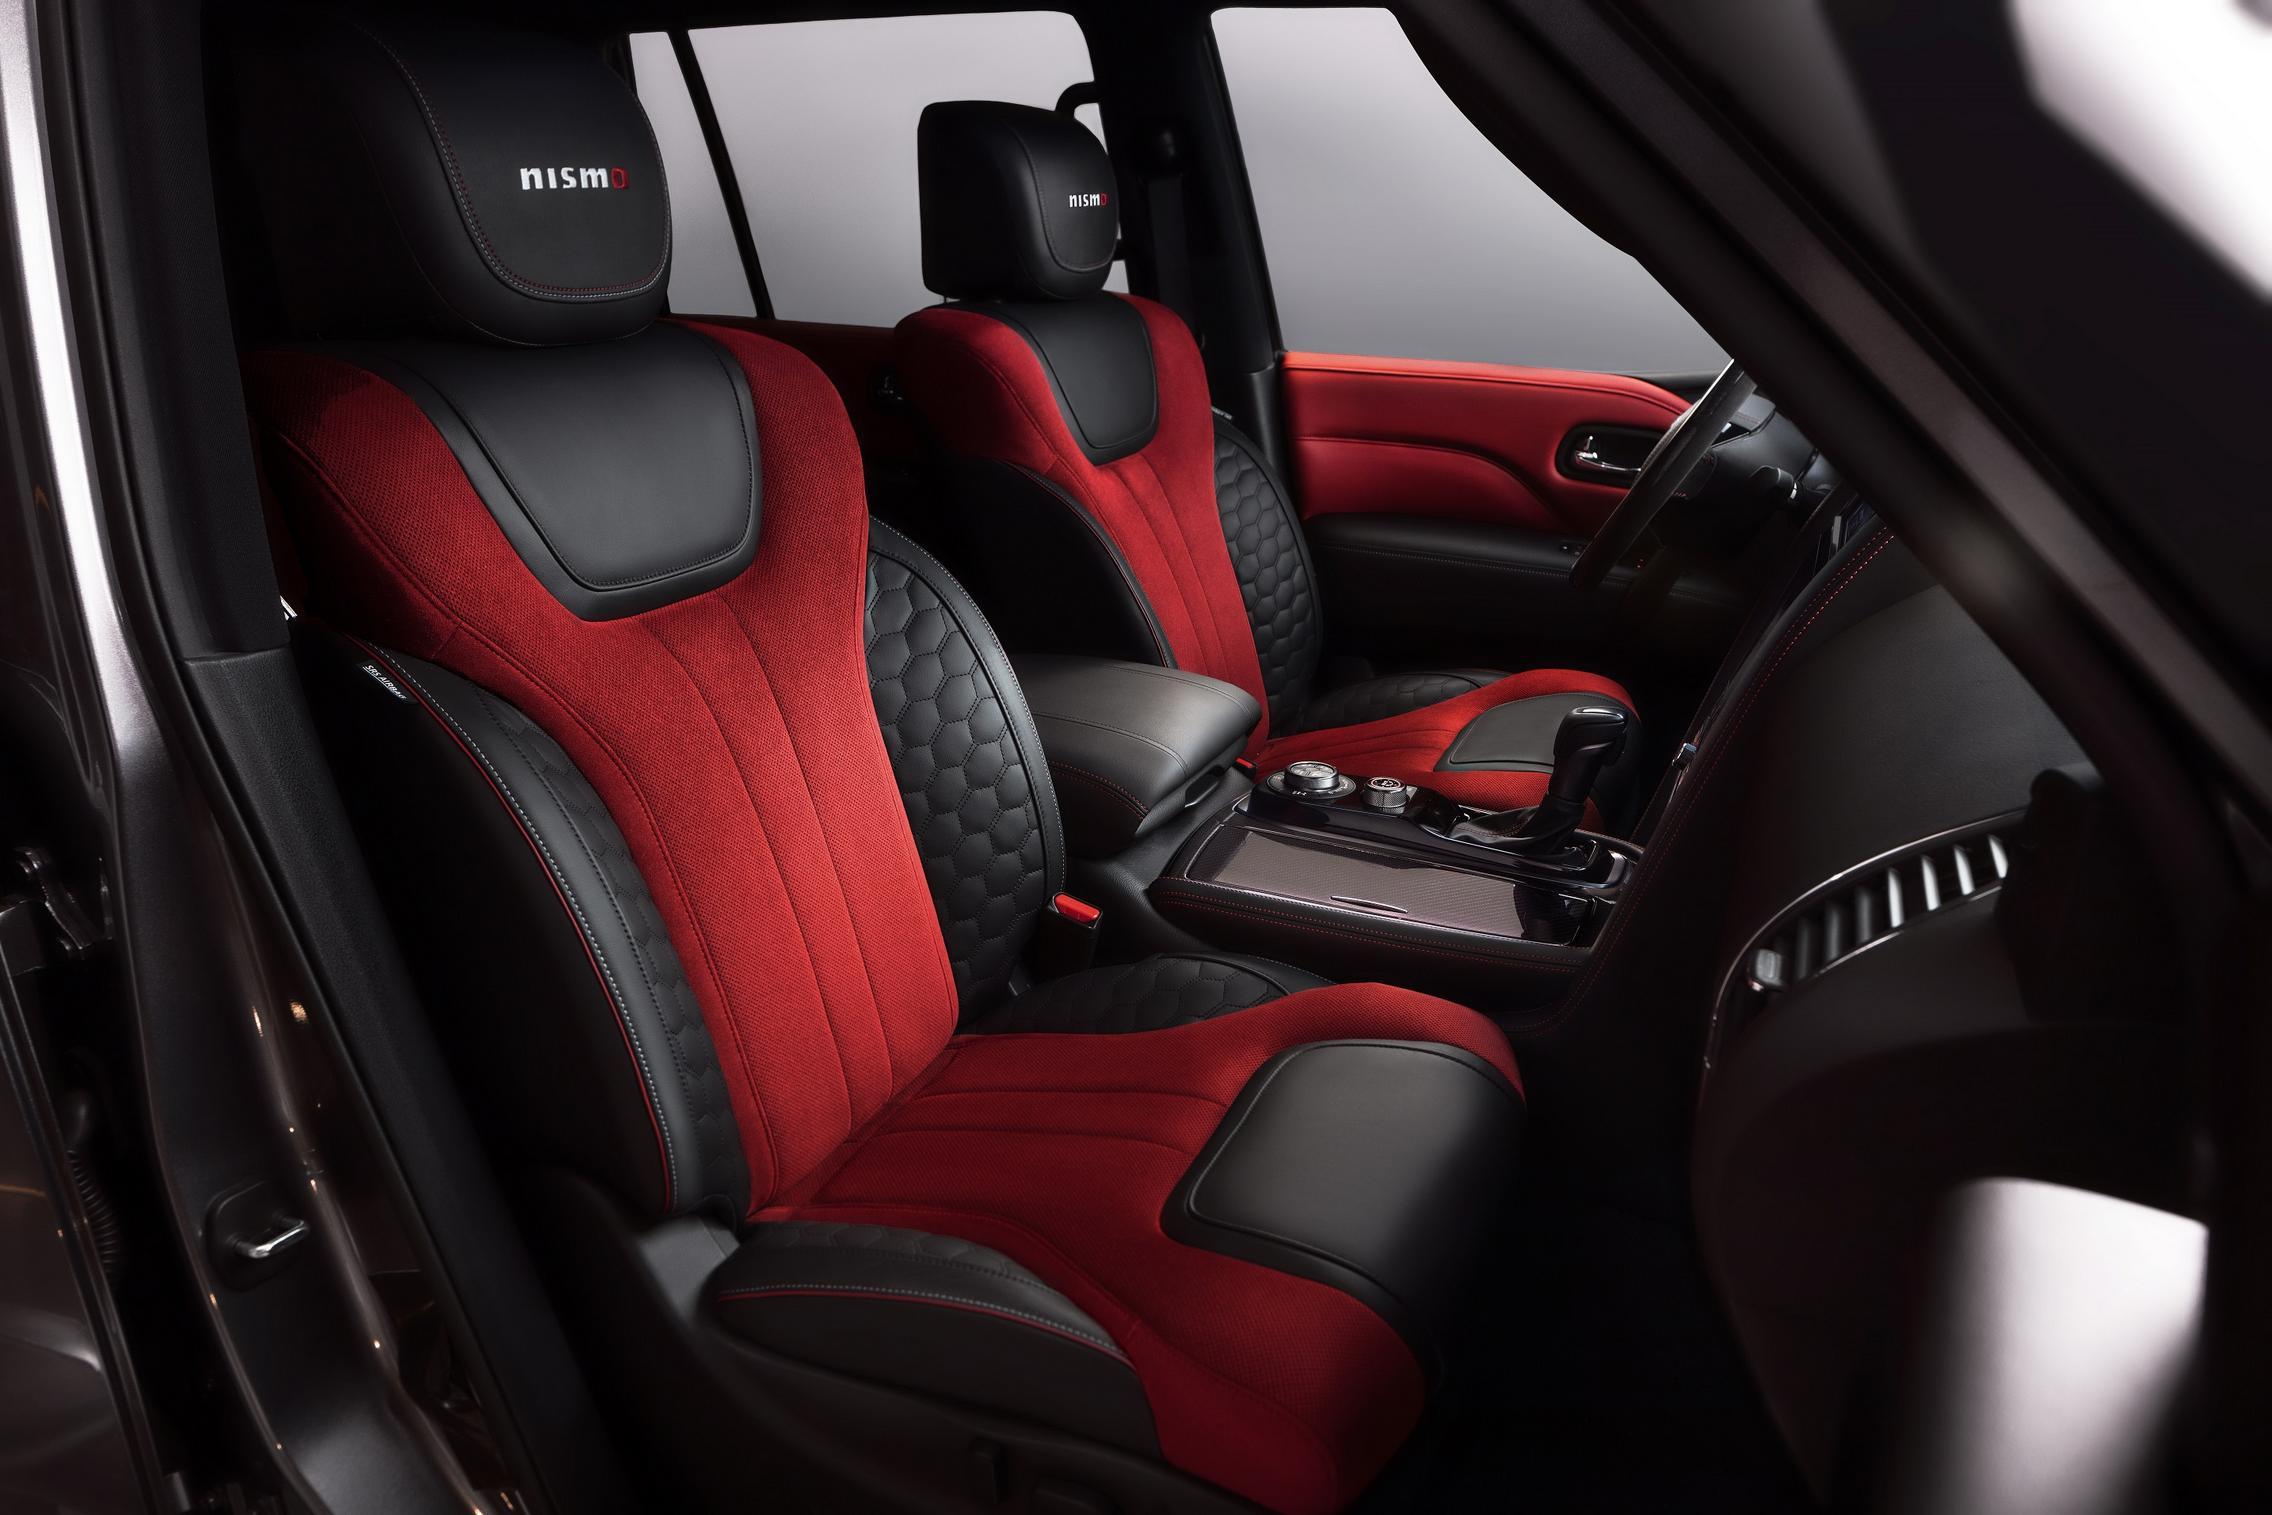 2021 Nissan Patrol NISMO seats